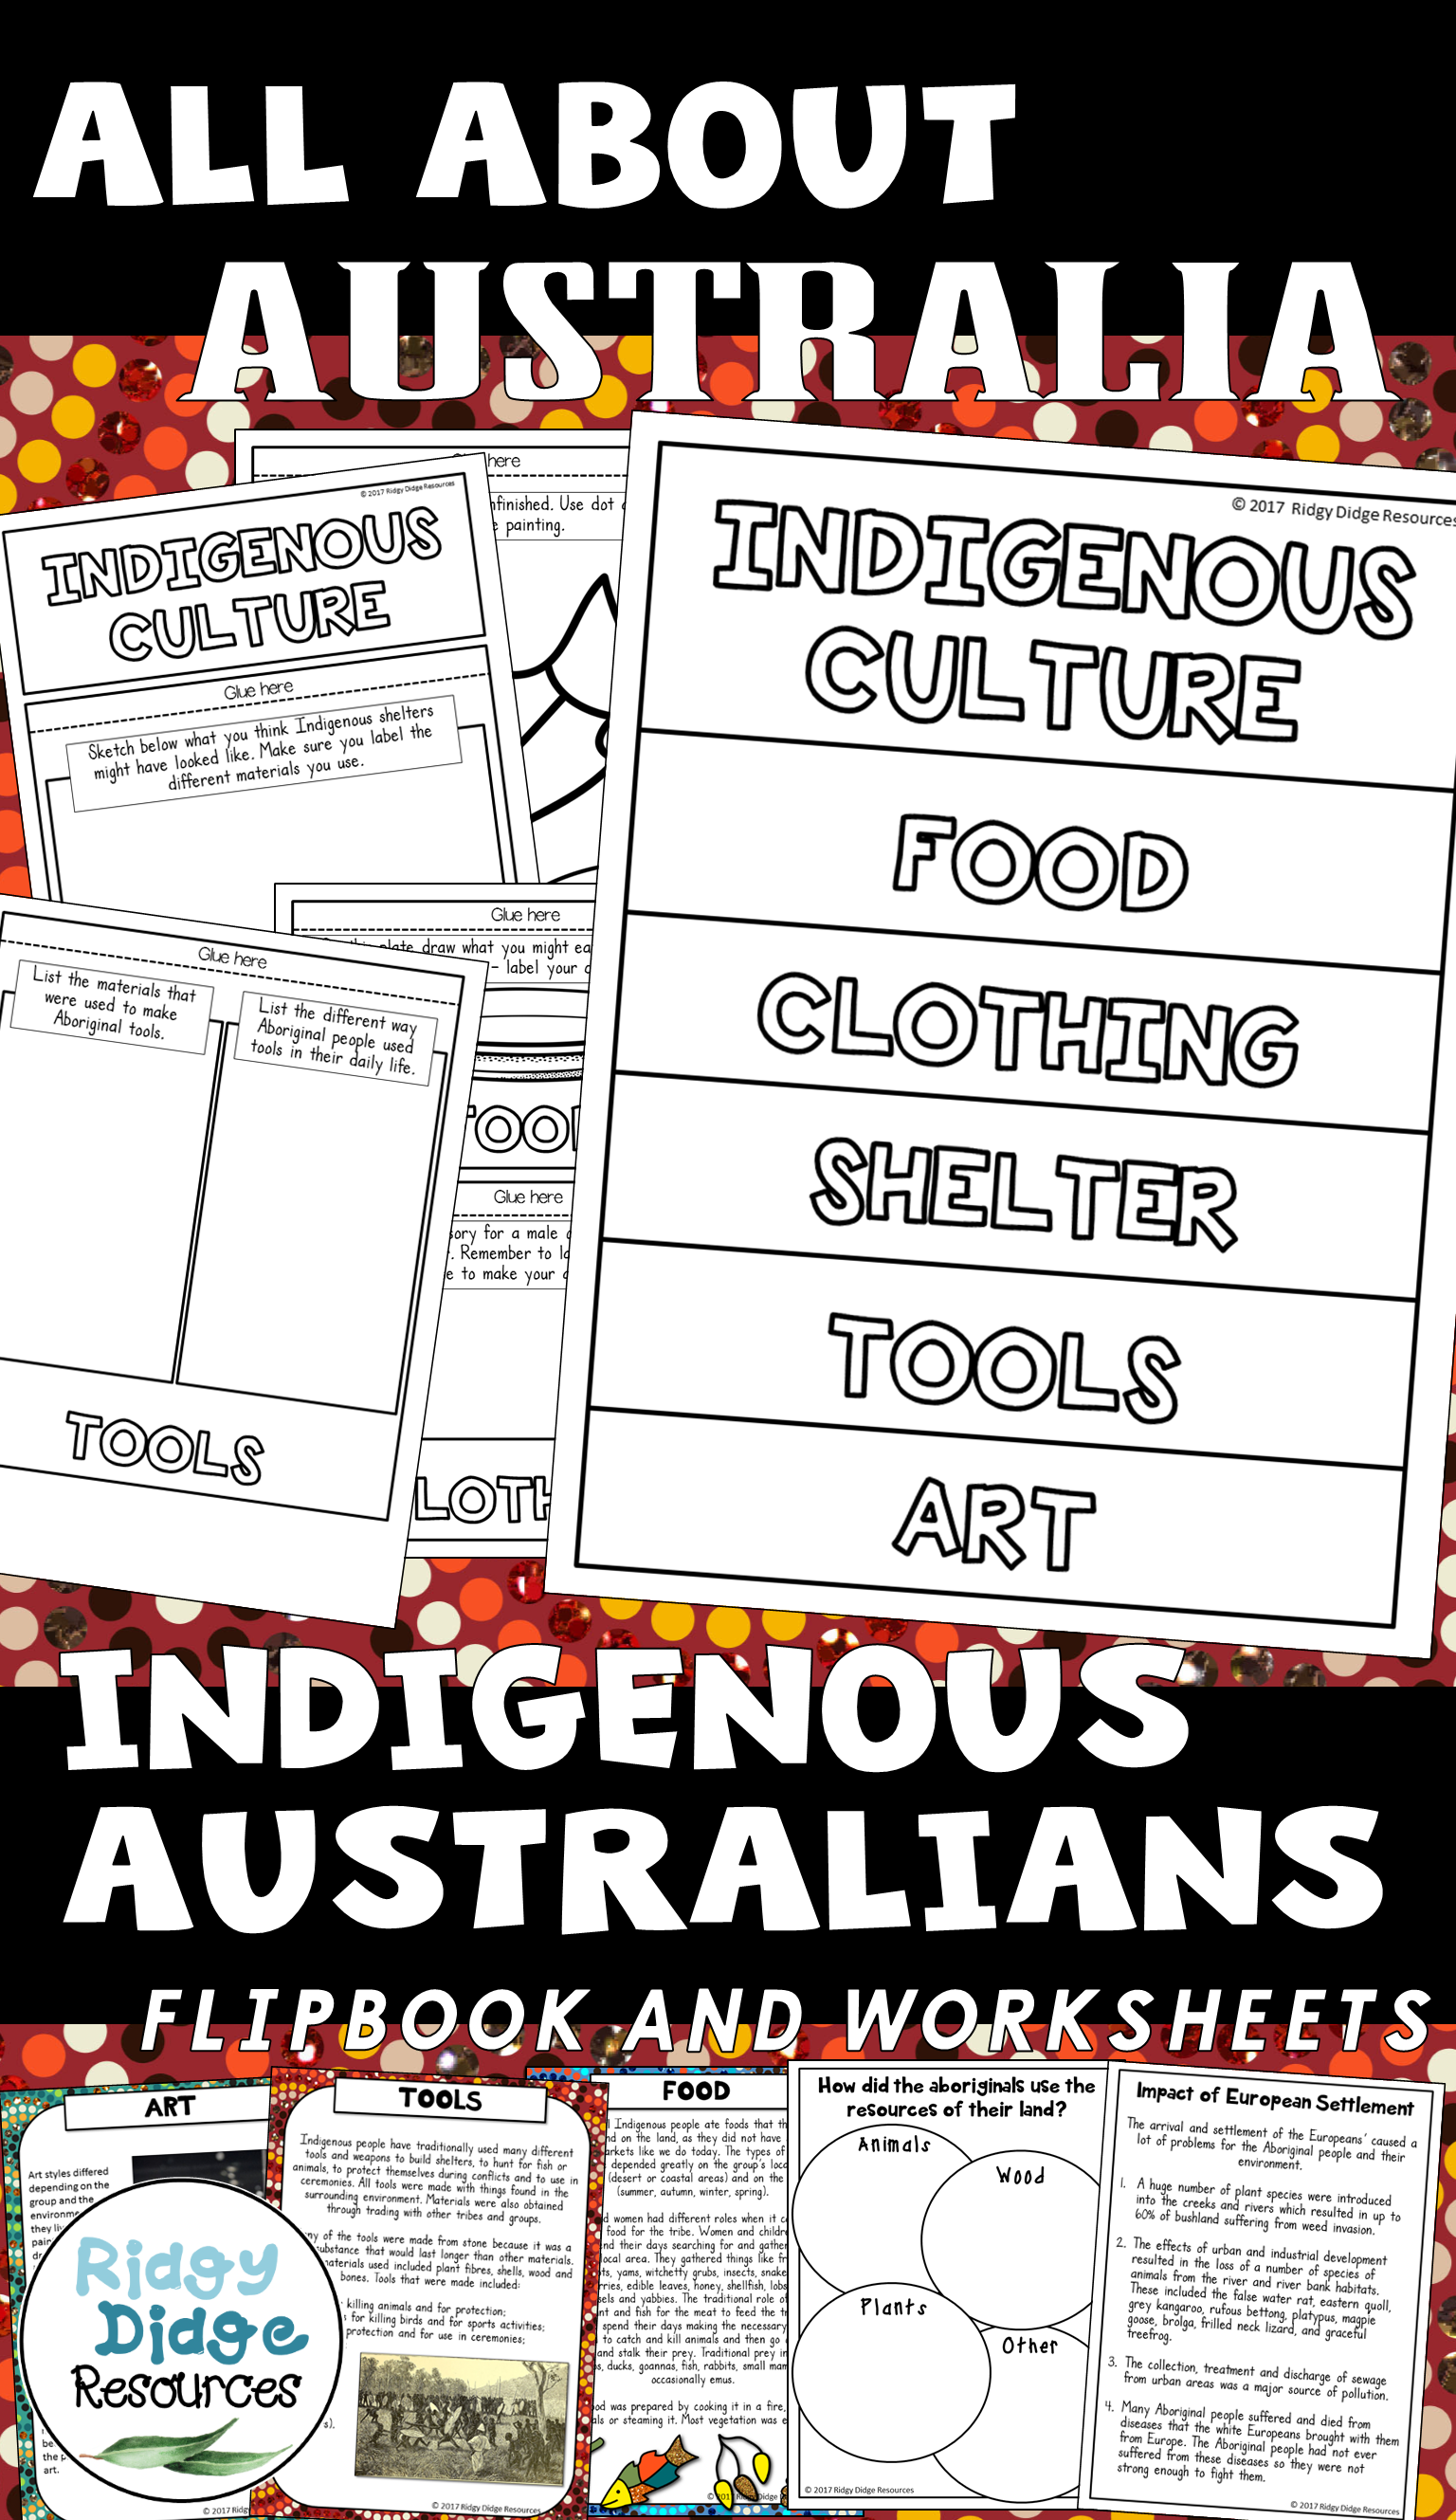 Indigenous Australians Flipbook Worksheets Information